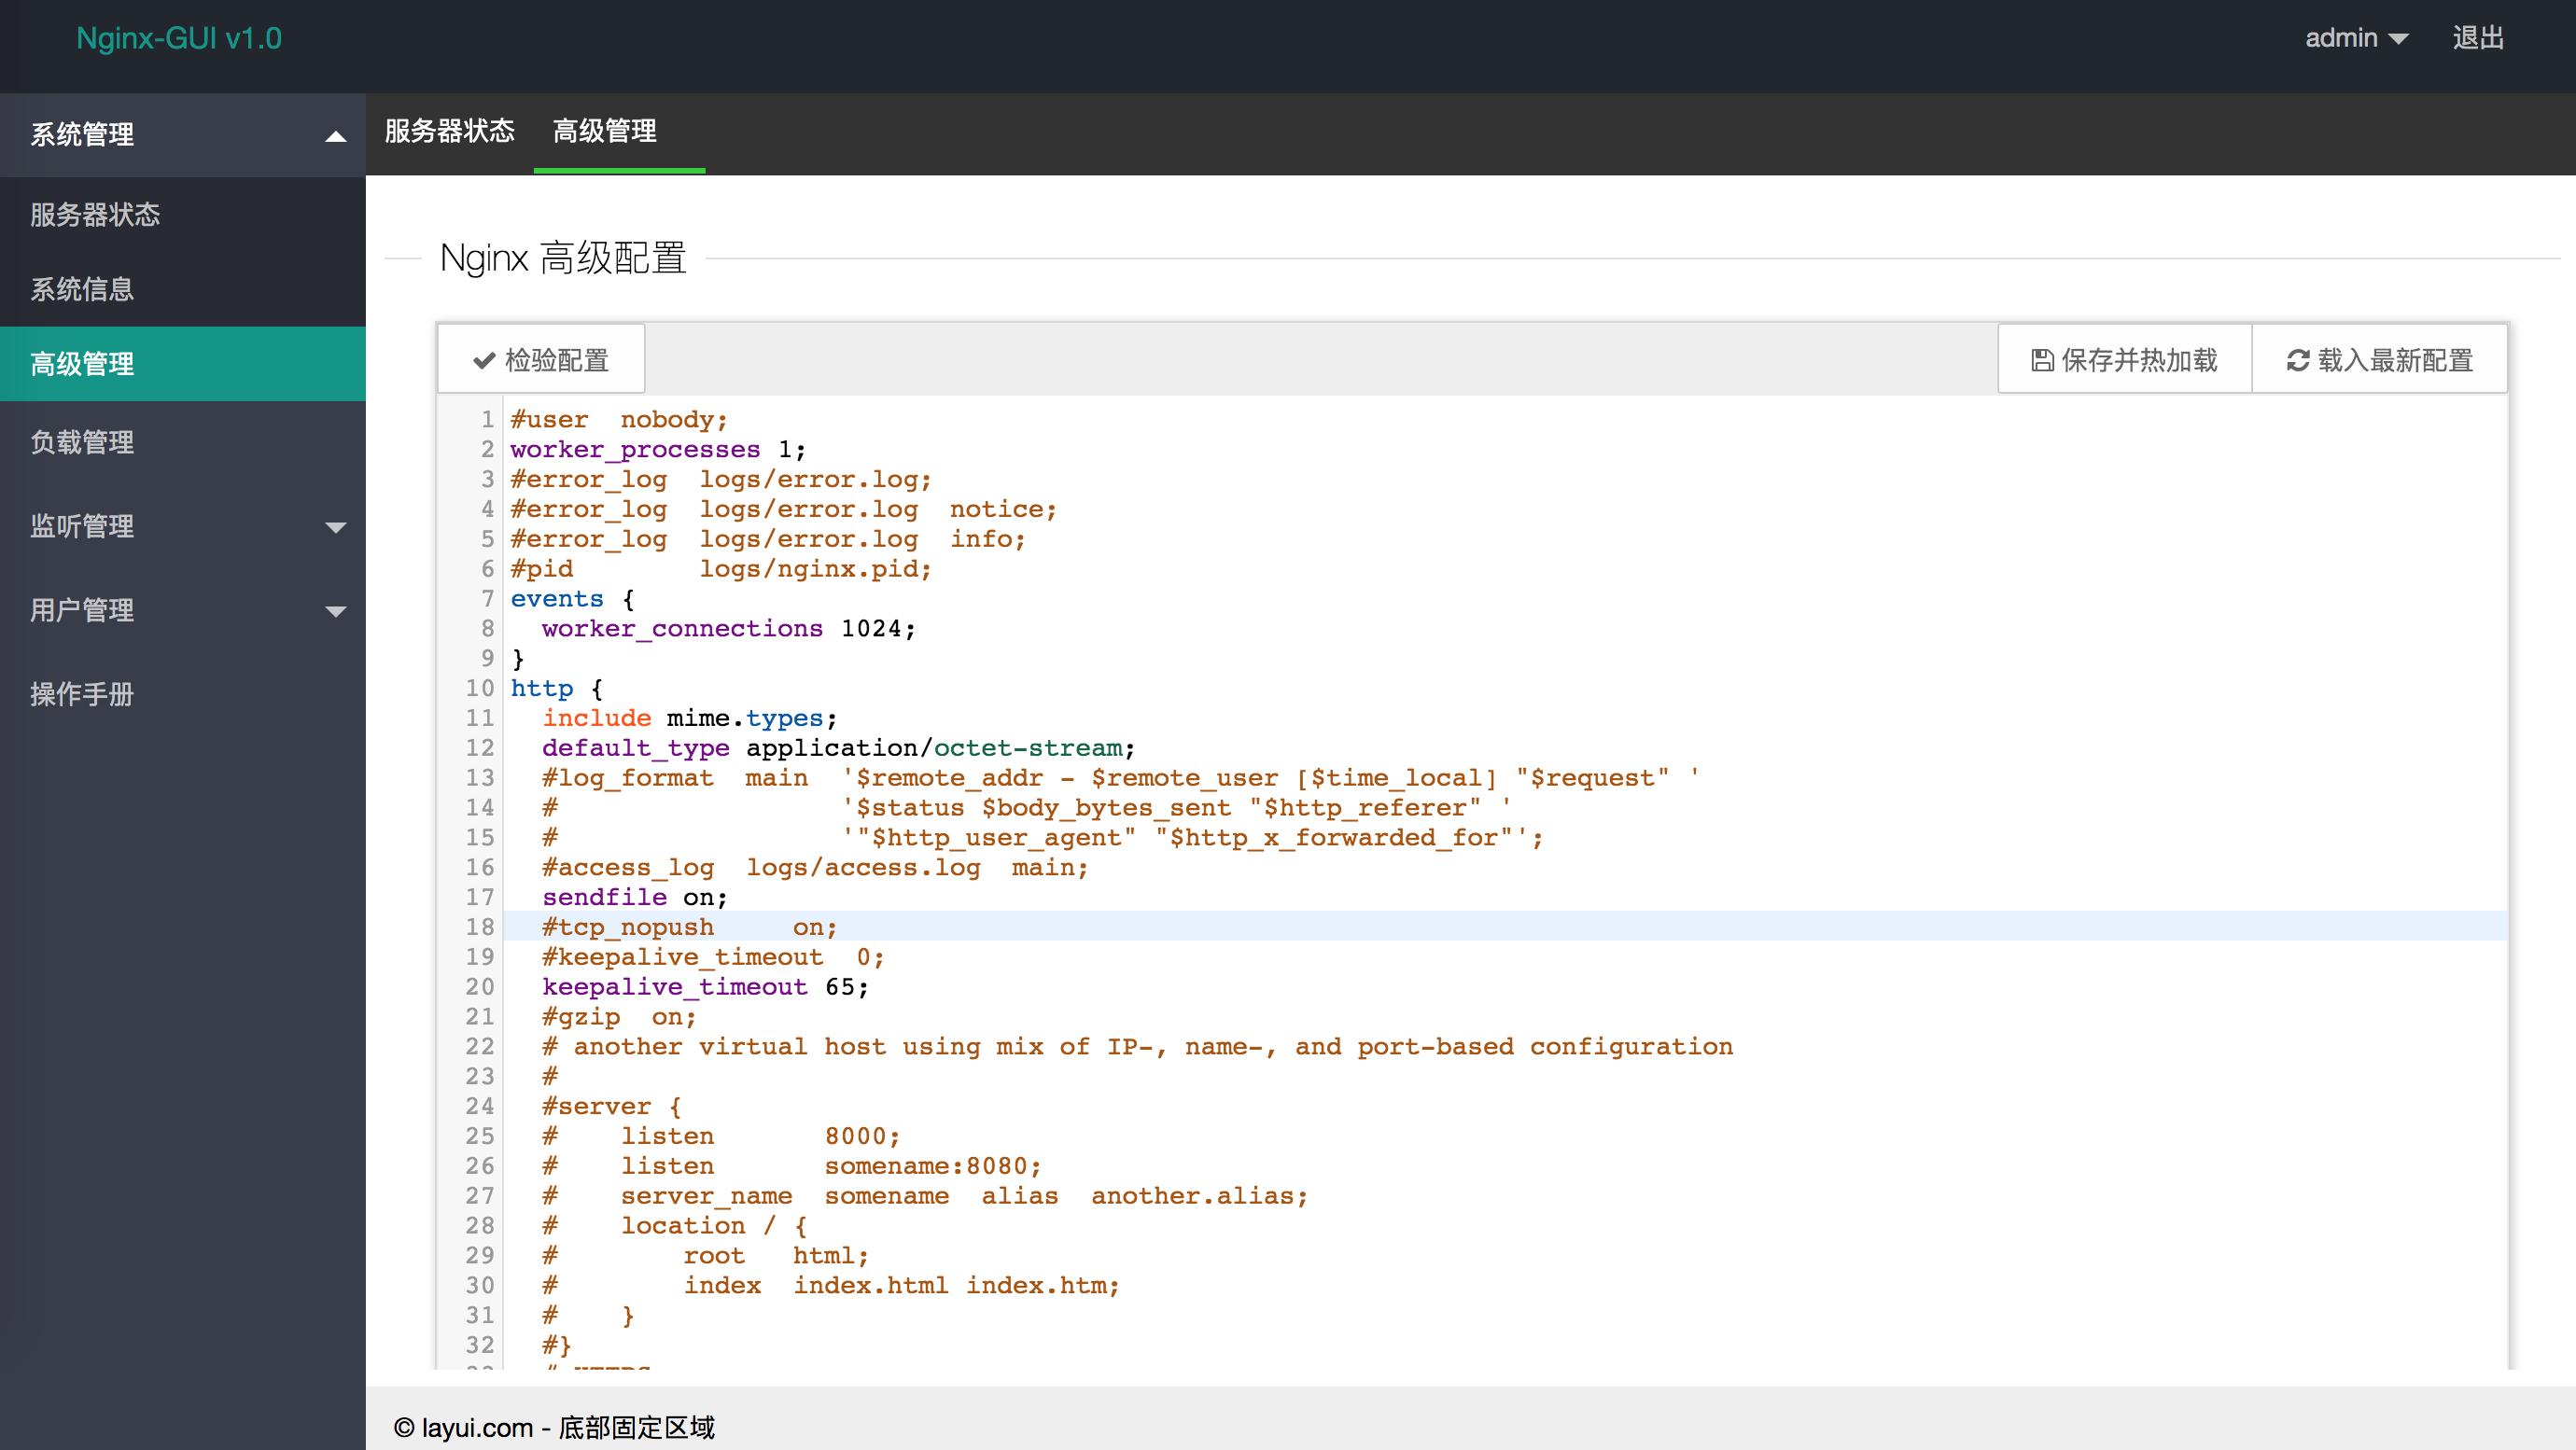 Nginx 可视化!配置监控一条龙!Nginx-GUI入门